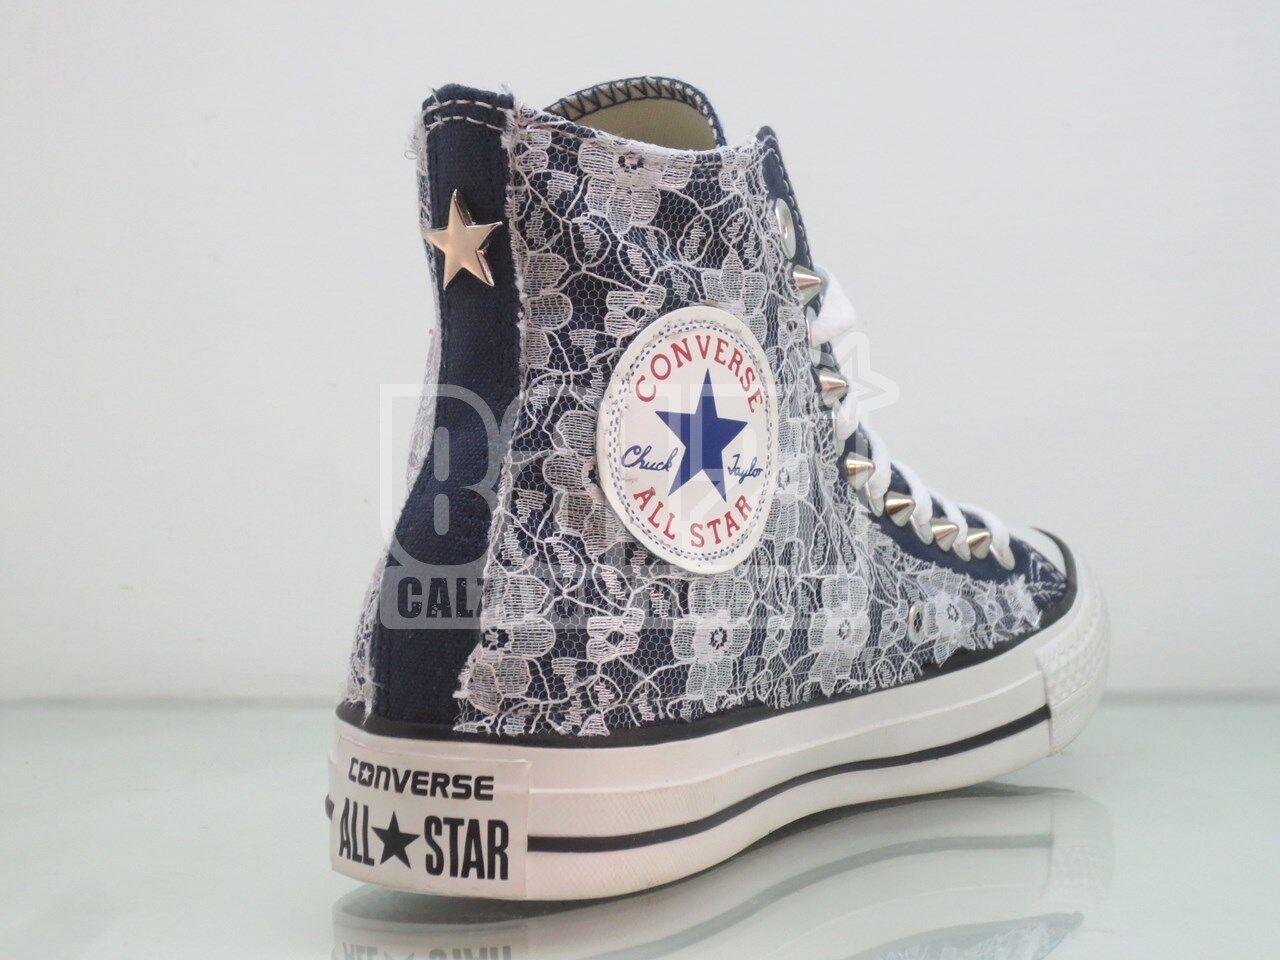 Converse Stellina all star pizzo borchie Stellina Converse navy blu artigianali 56e492